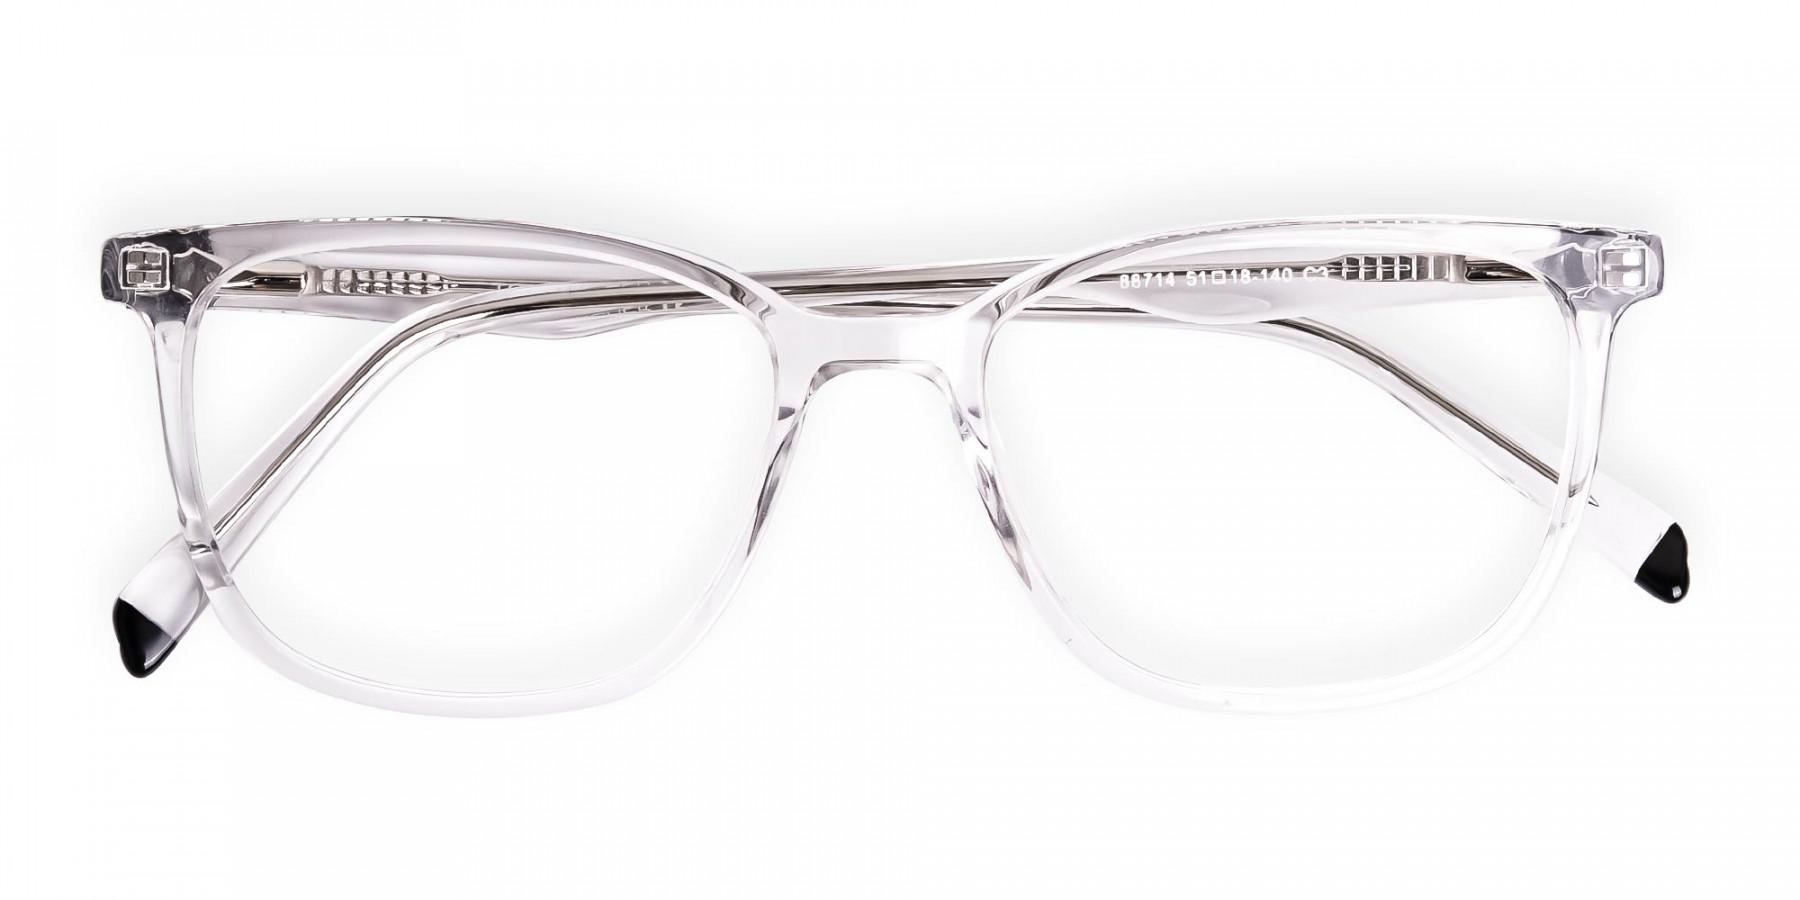 Transparent-Wayfarer-Rectangular-Glasses-Frames-1